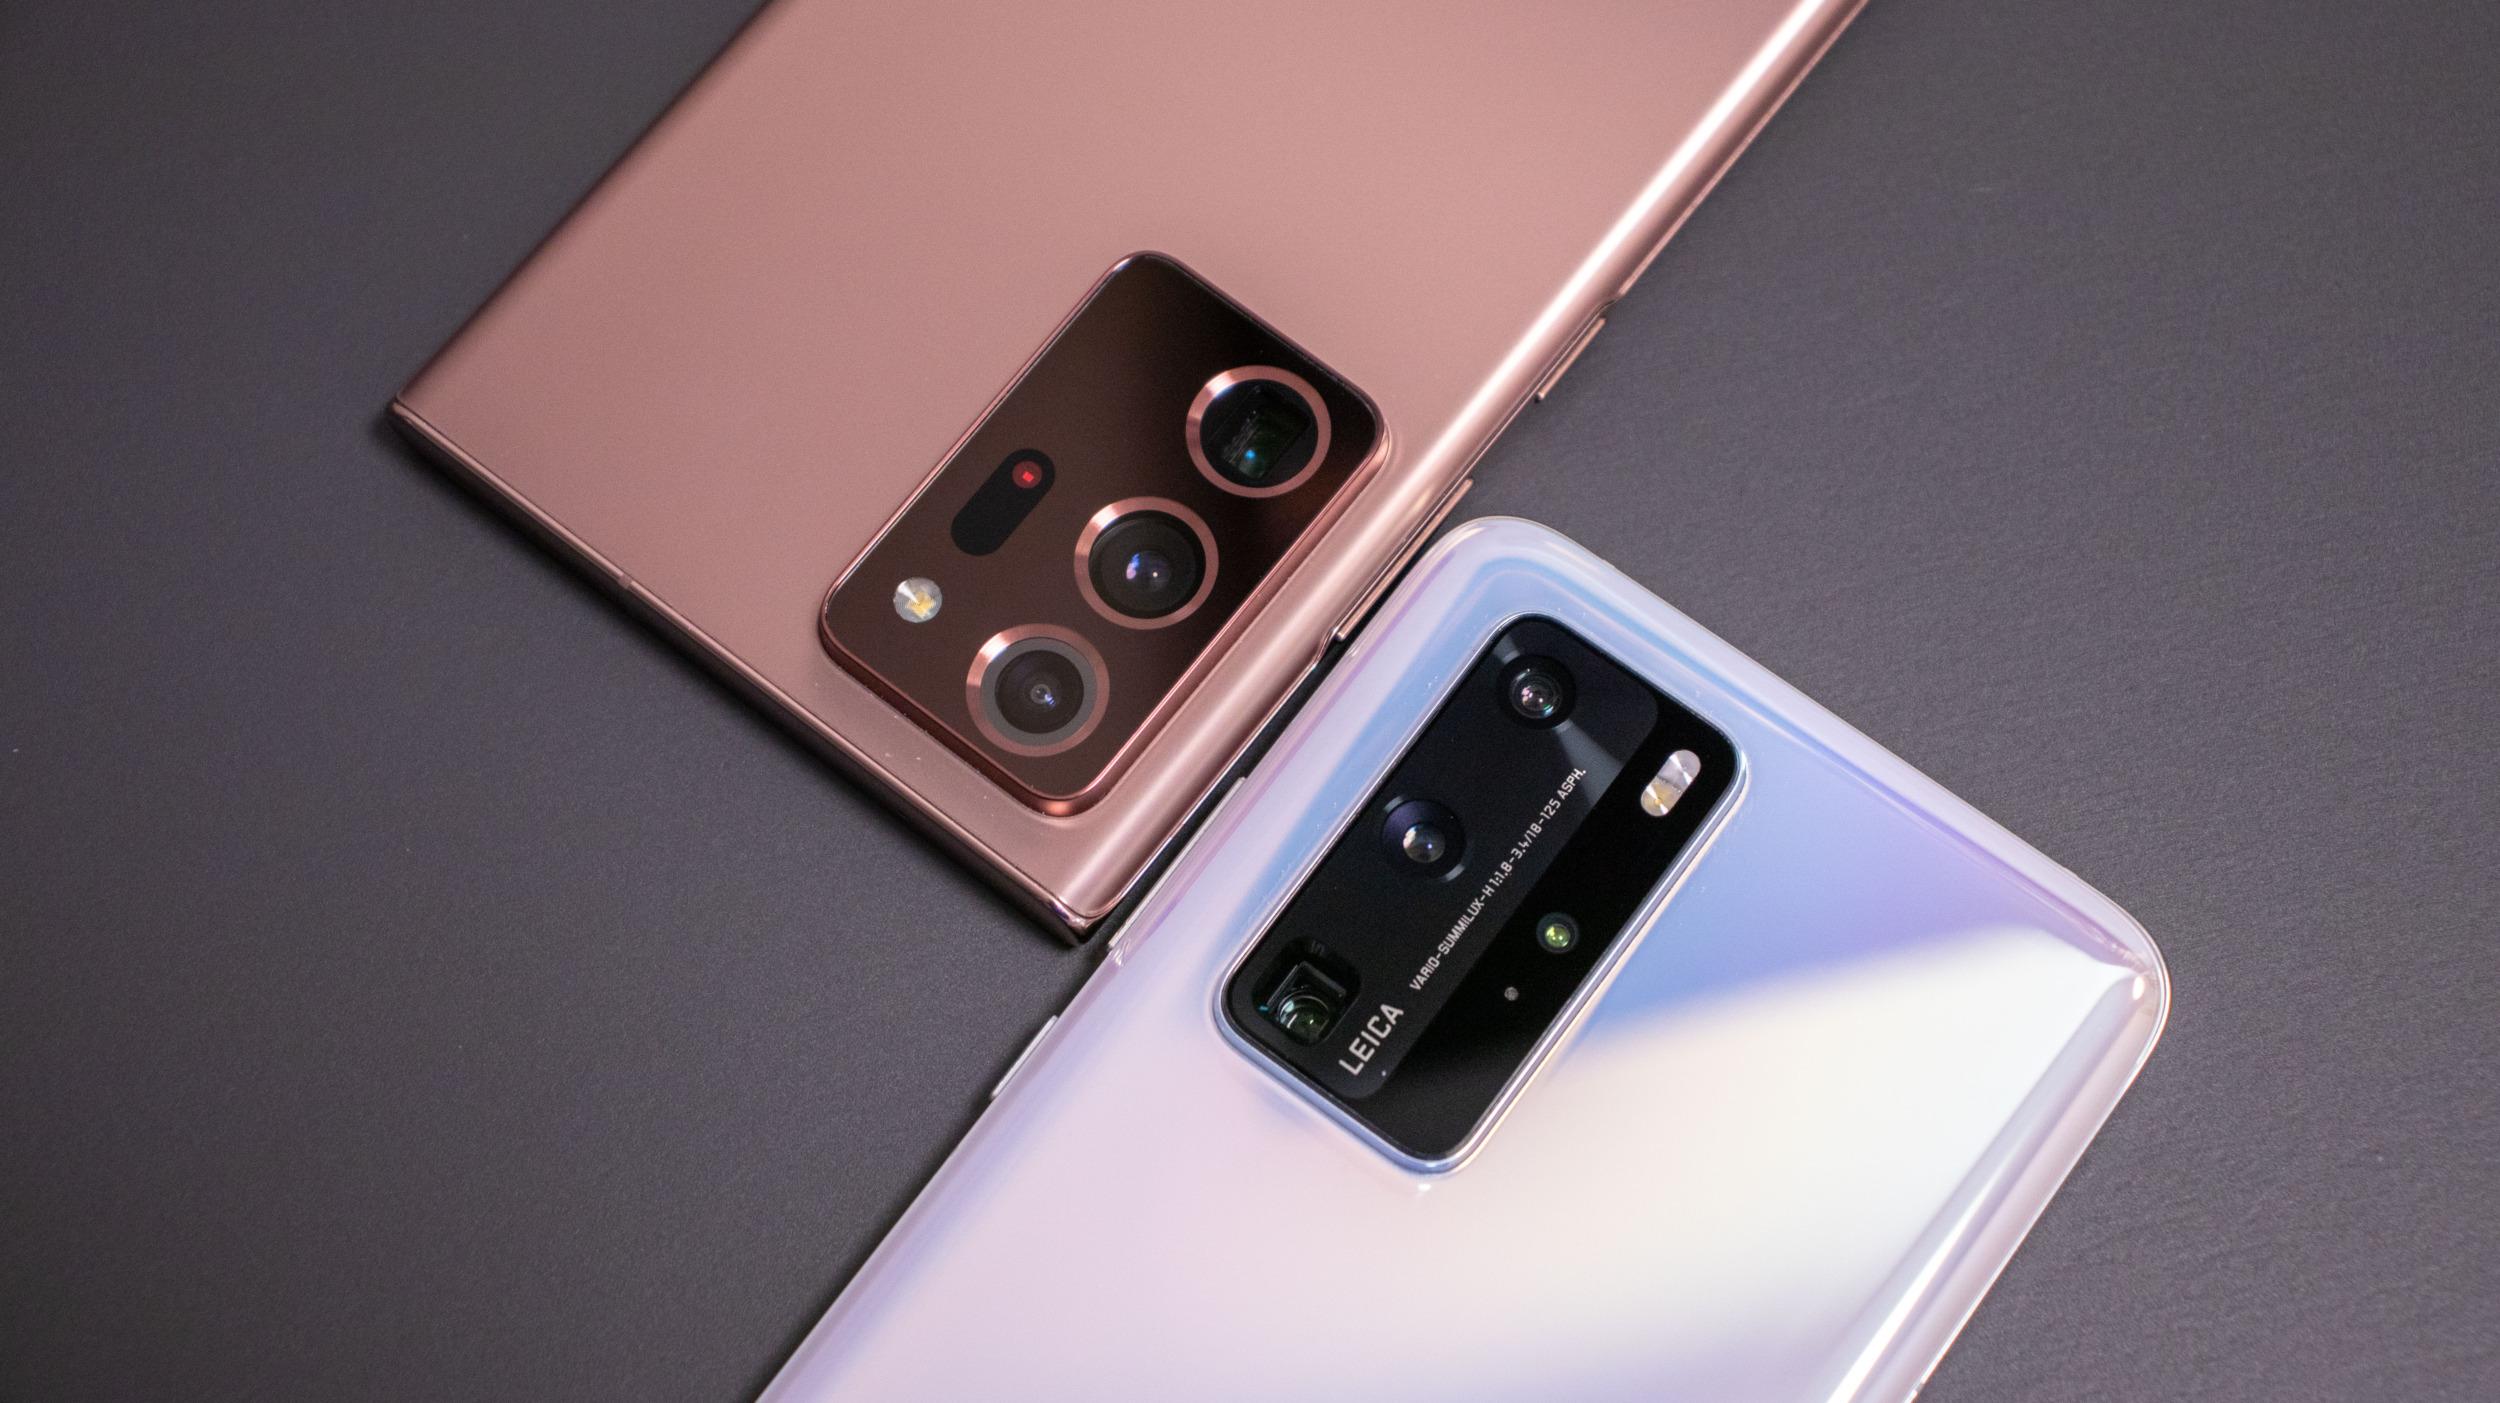 Zoom souboj – Galaxy Note 20 Ultra vs Huawei P40 Pro [fototest]